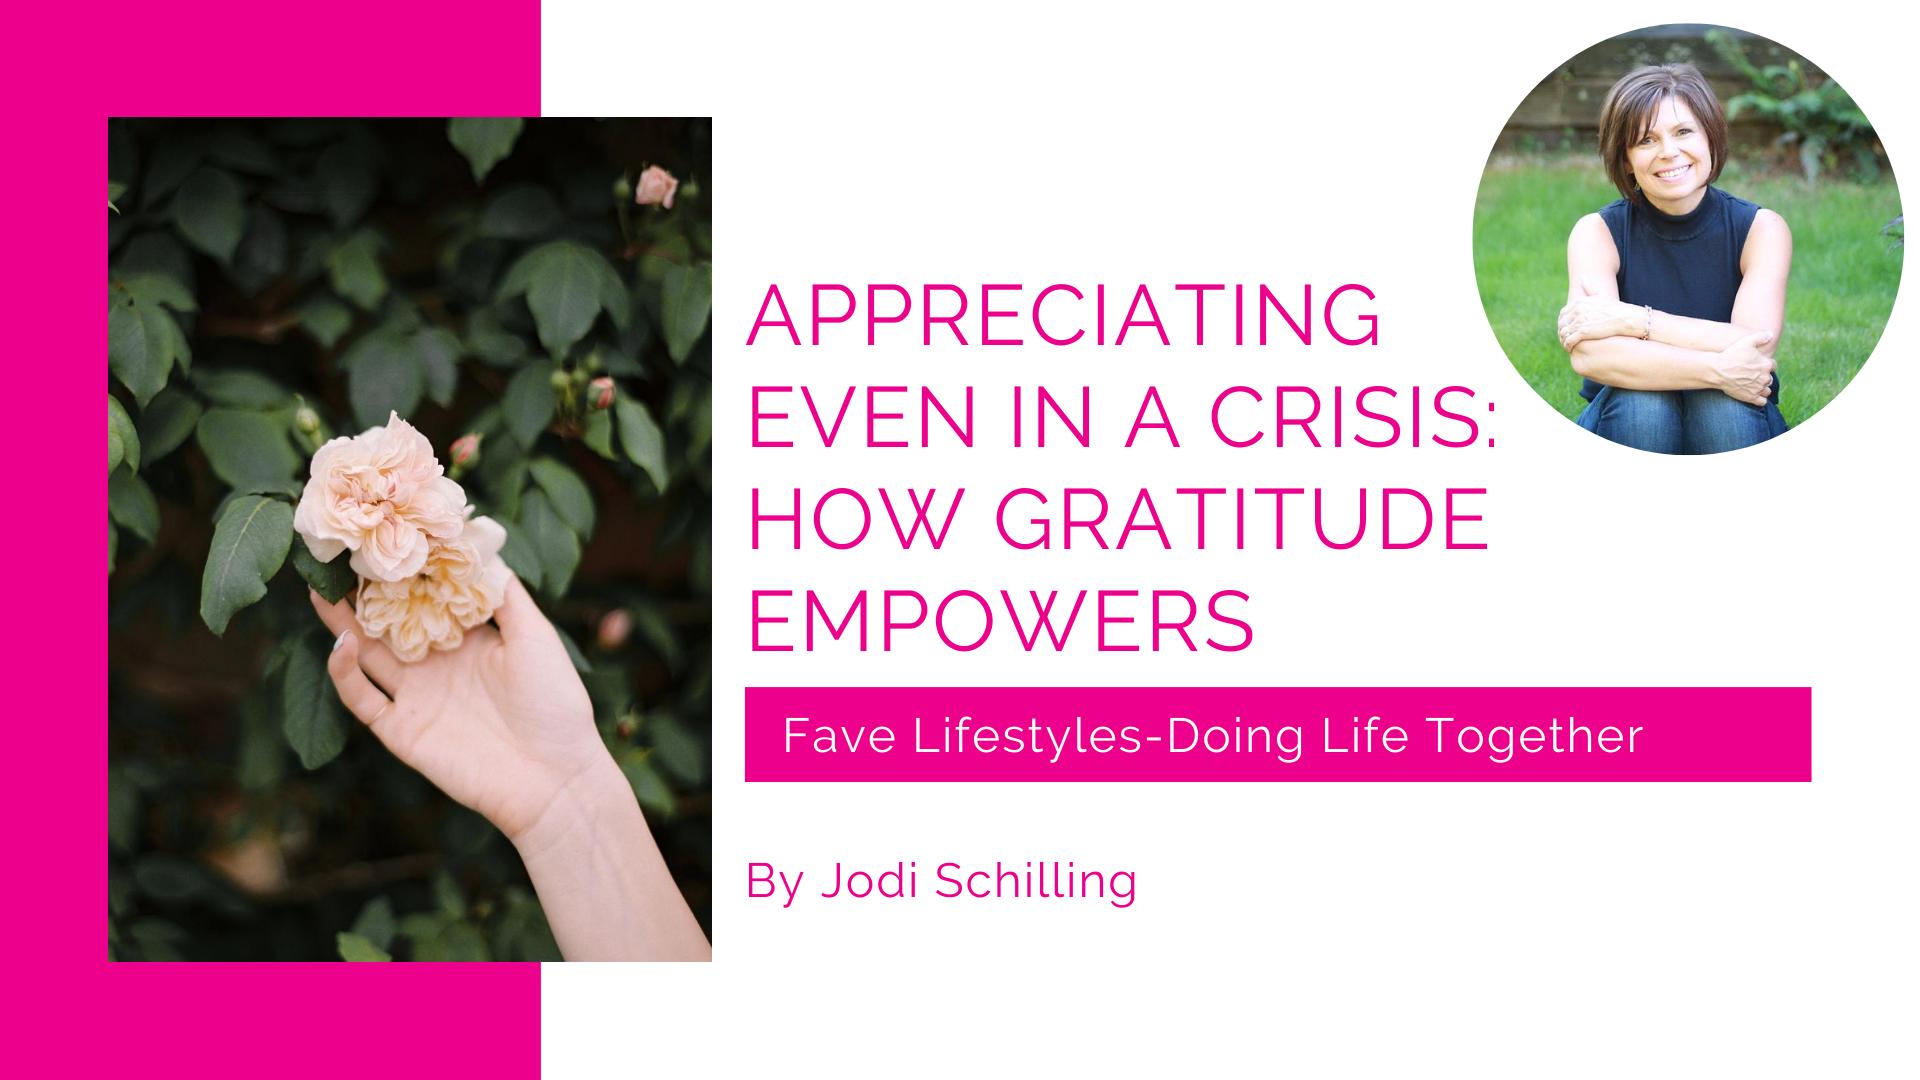 Appreciating Even In a Crisis: How Gratitude Empowers